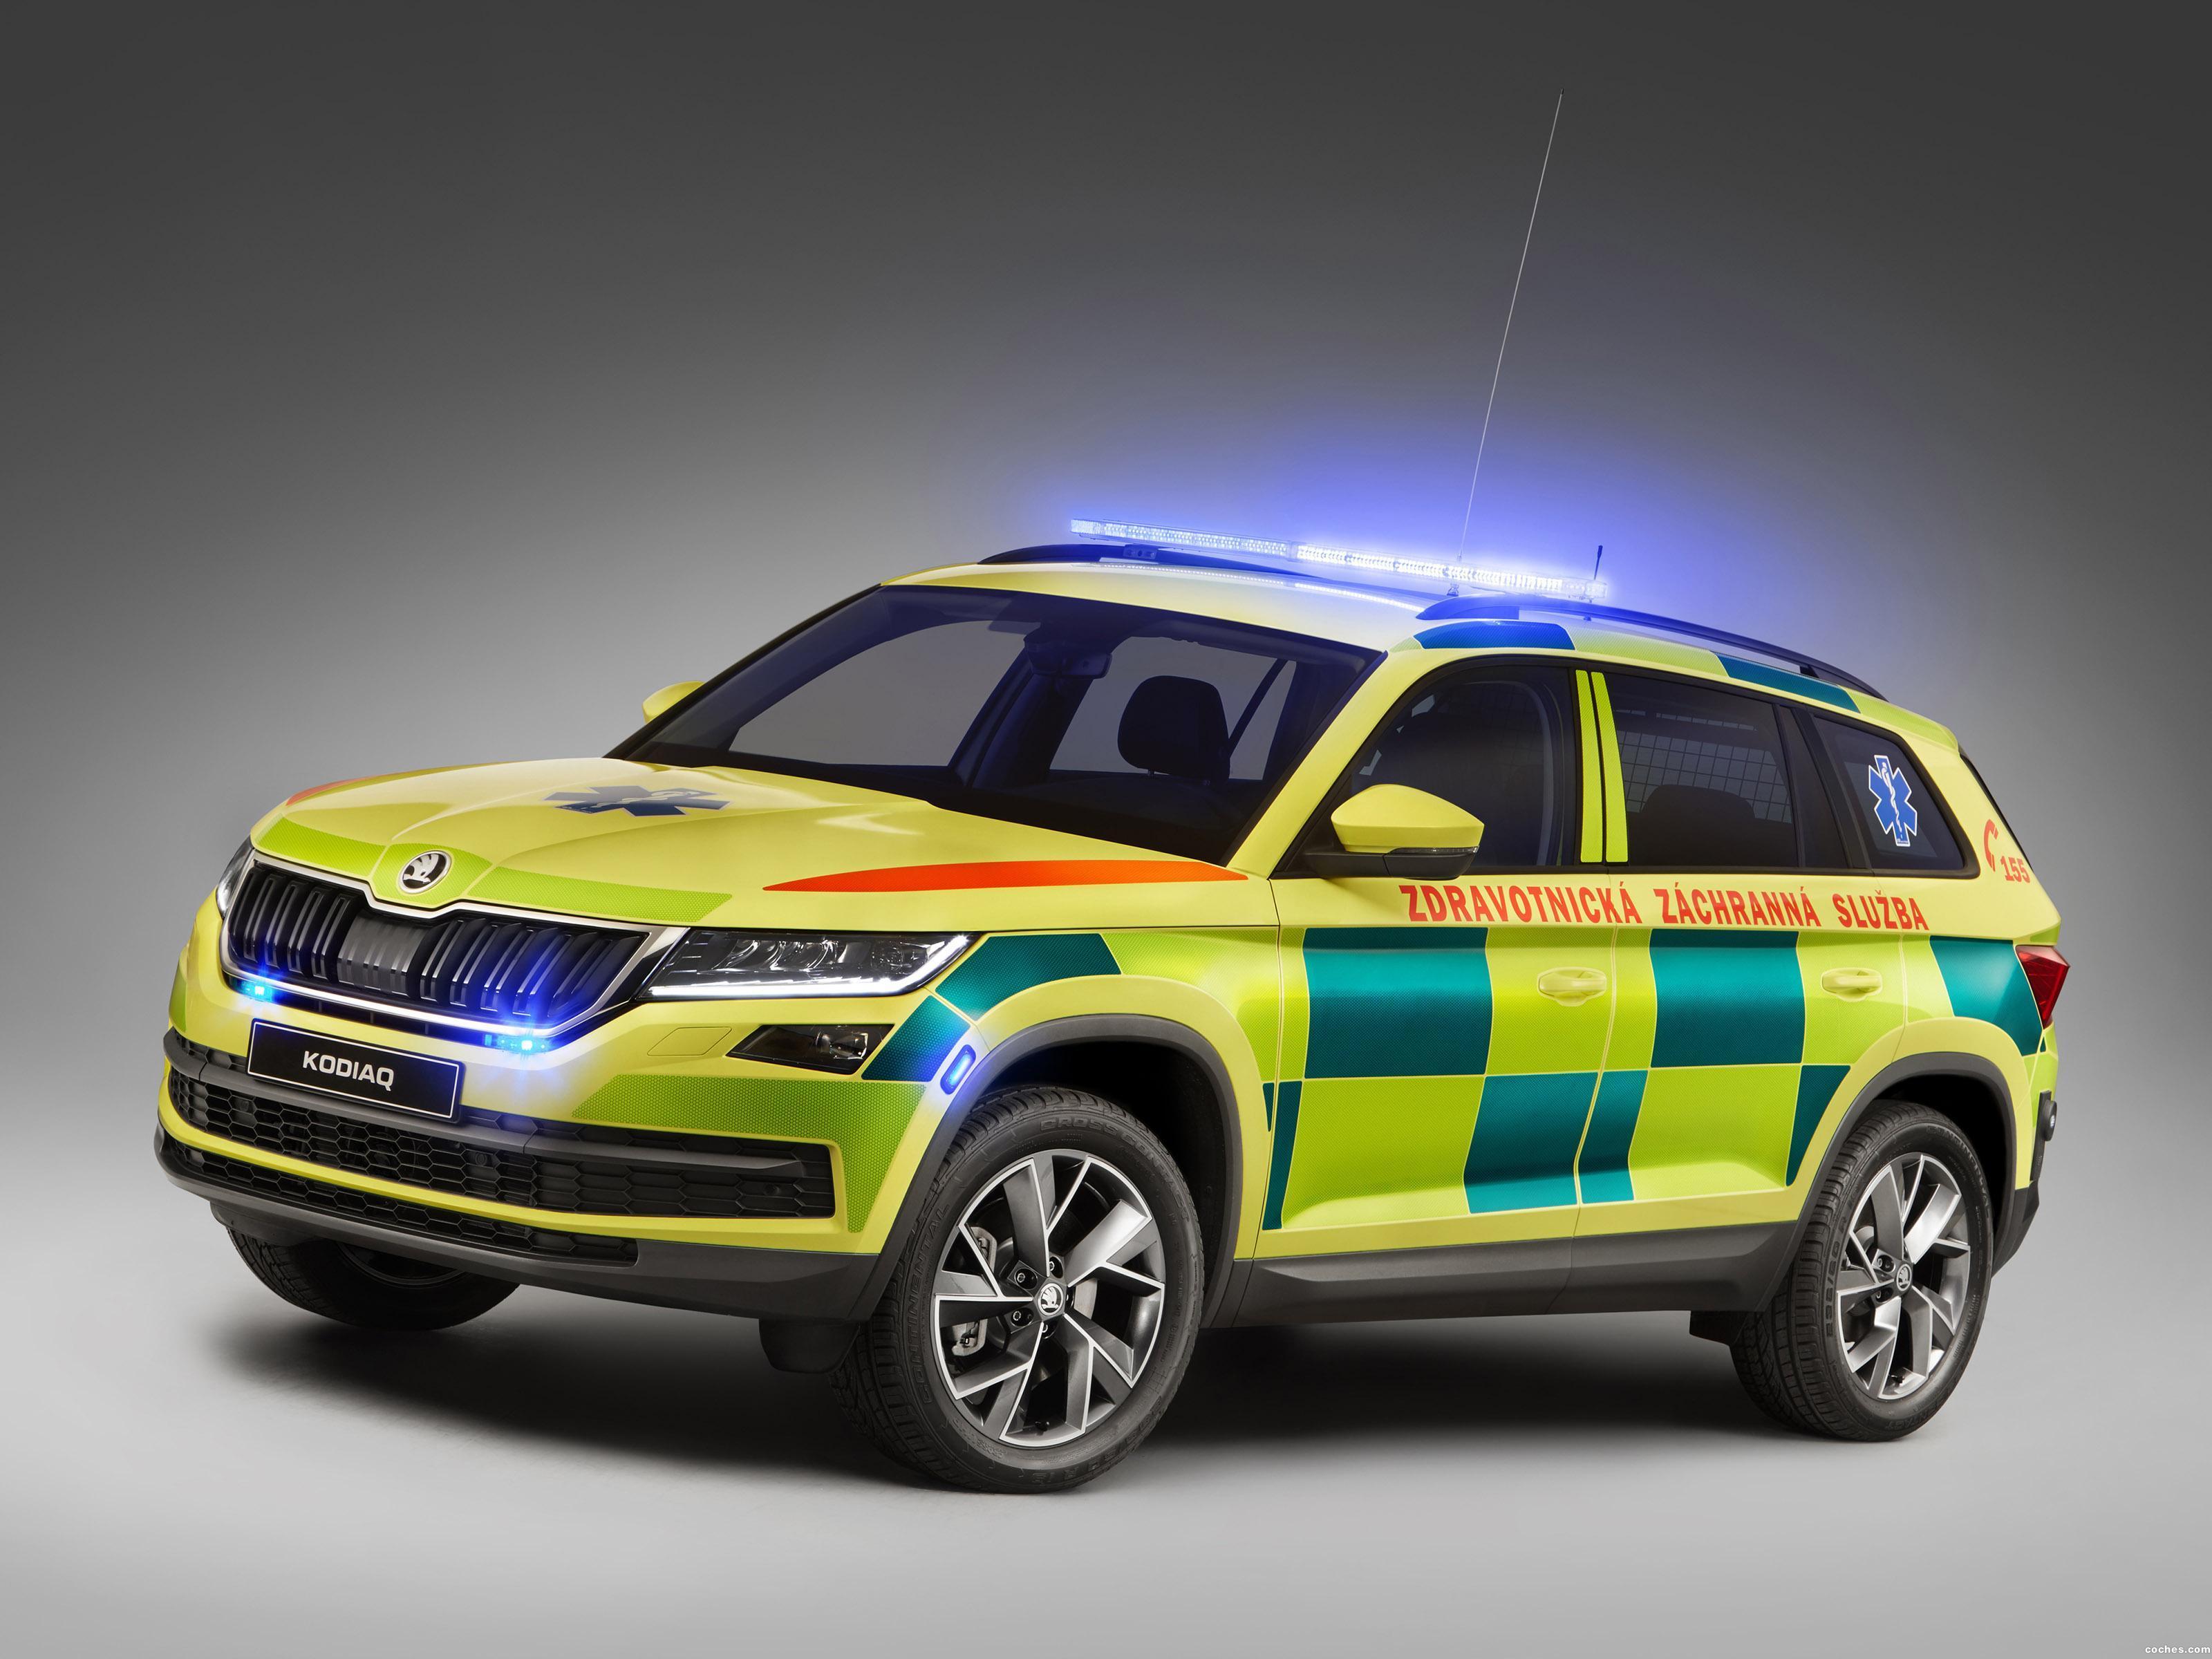 skoda_kodiaq-ambulance-2017_r4.jpg